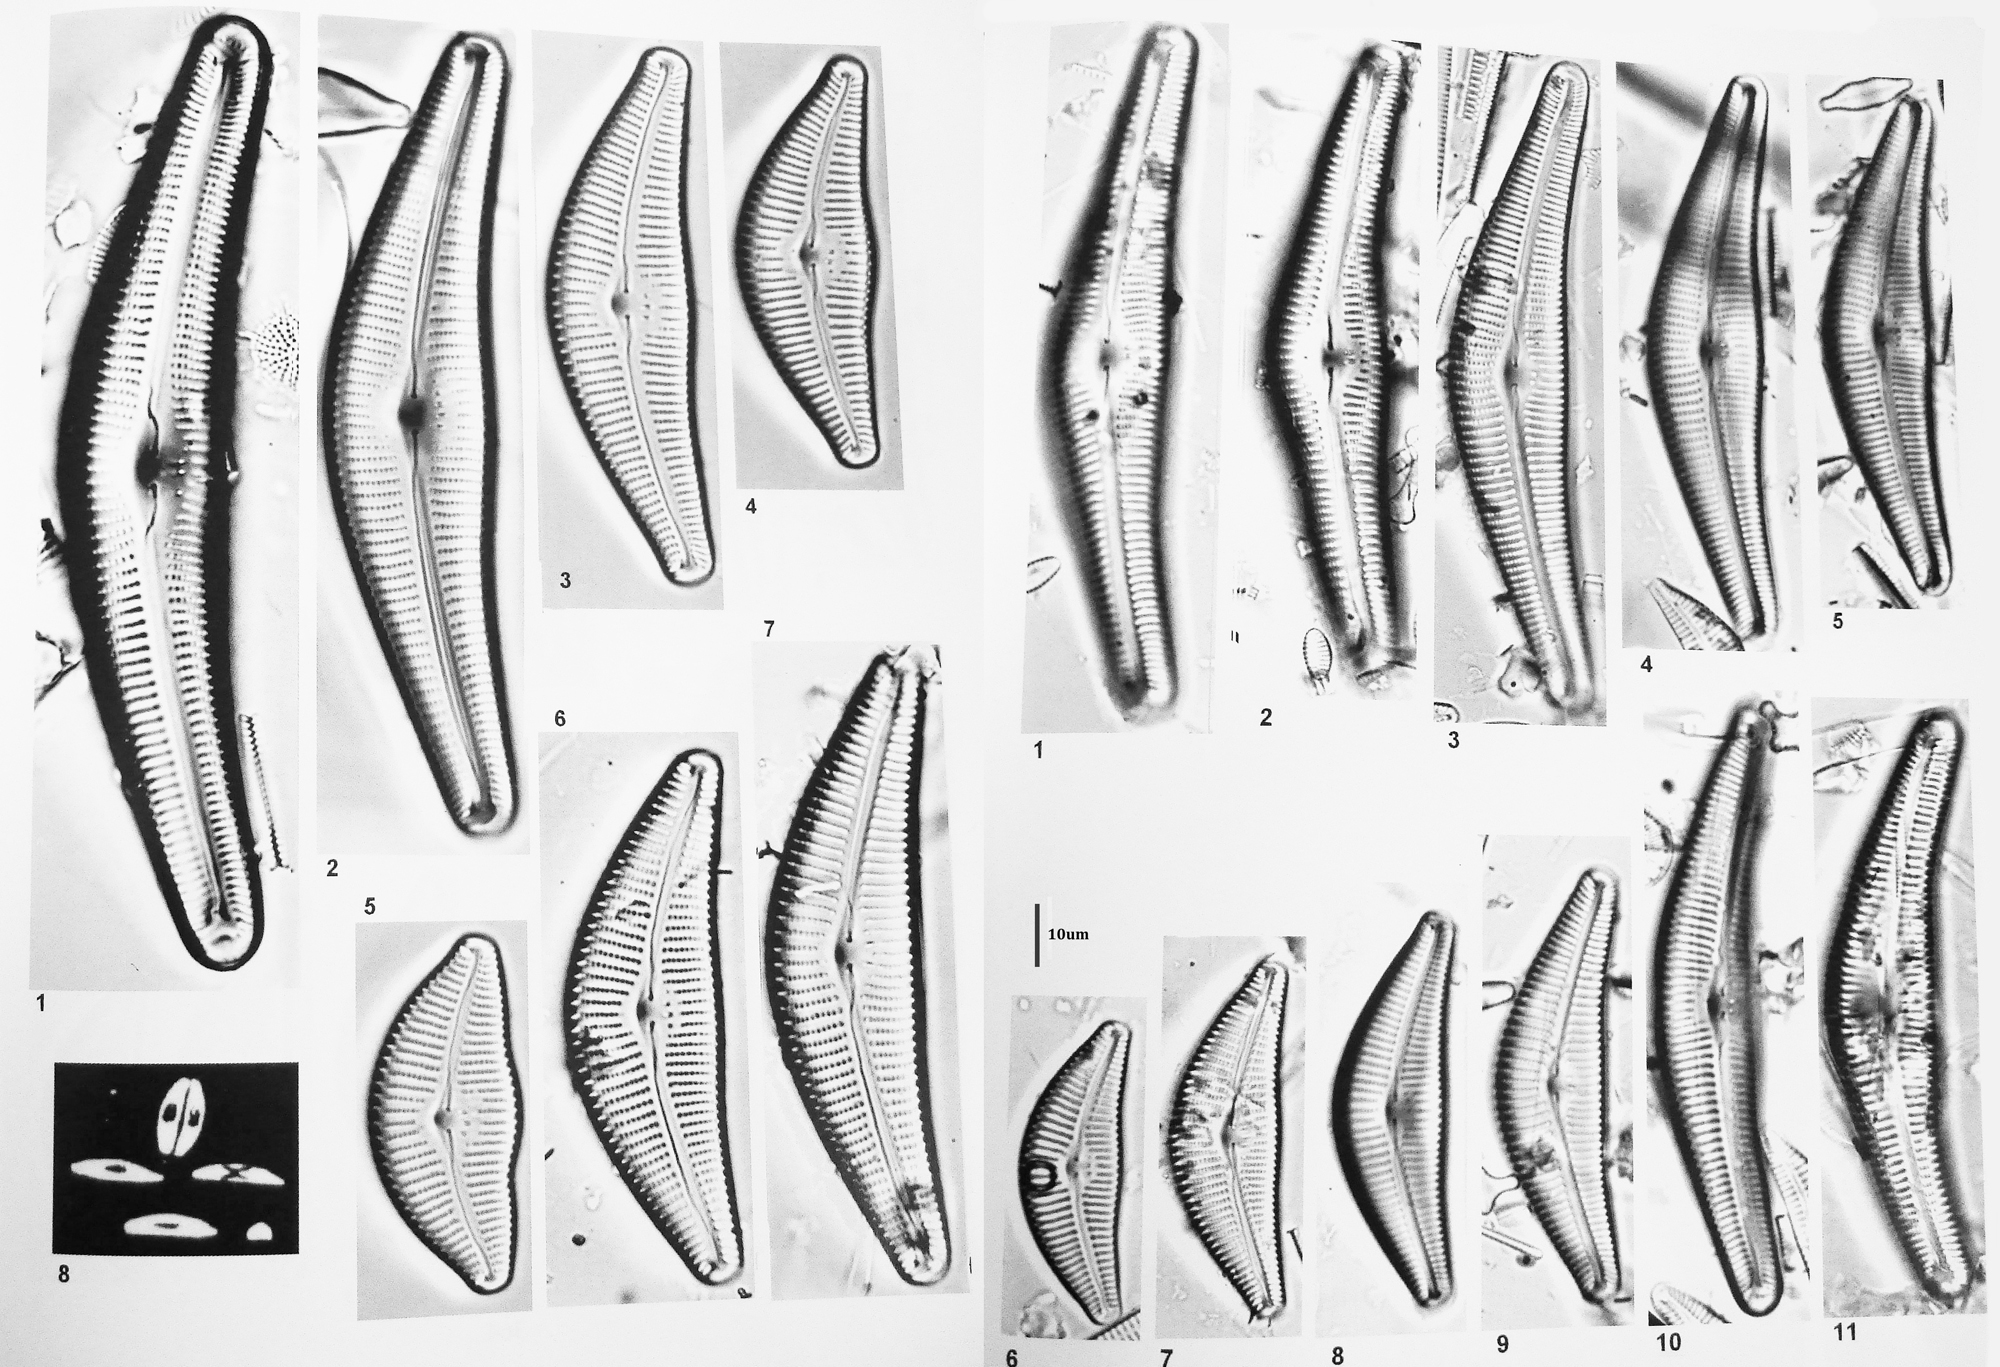 Cymbella neocistula orig illus